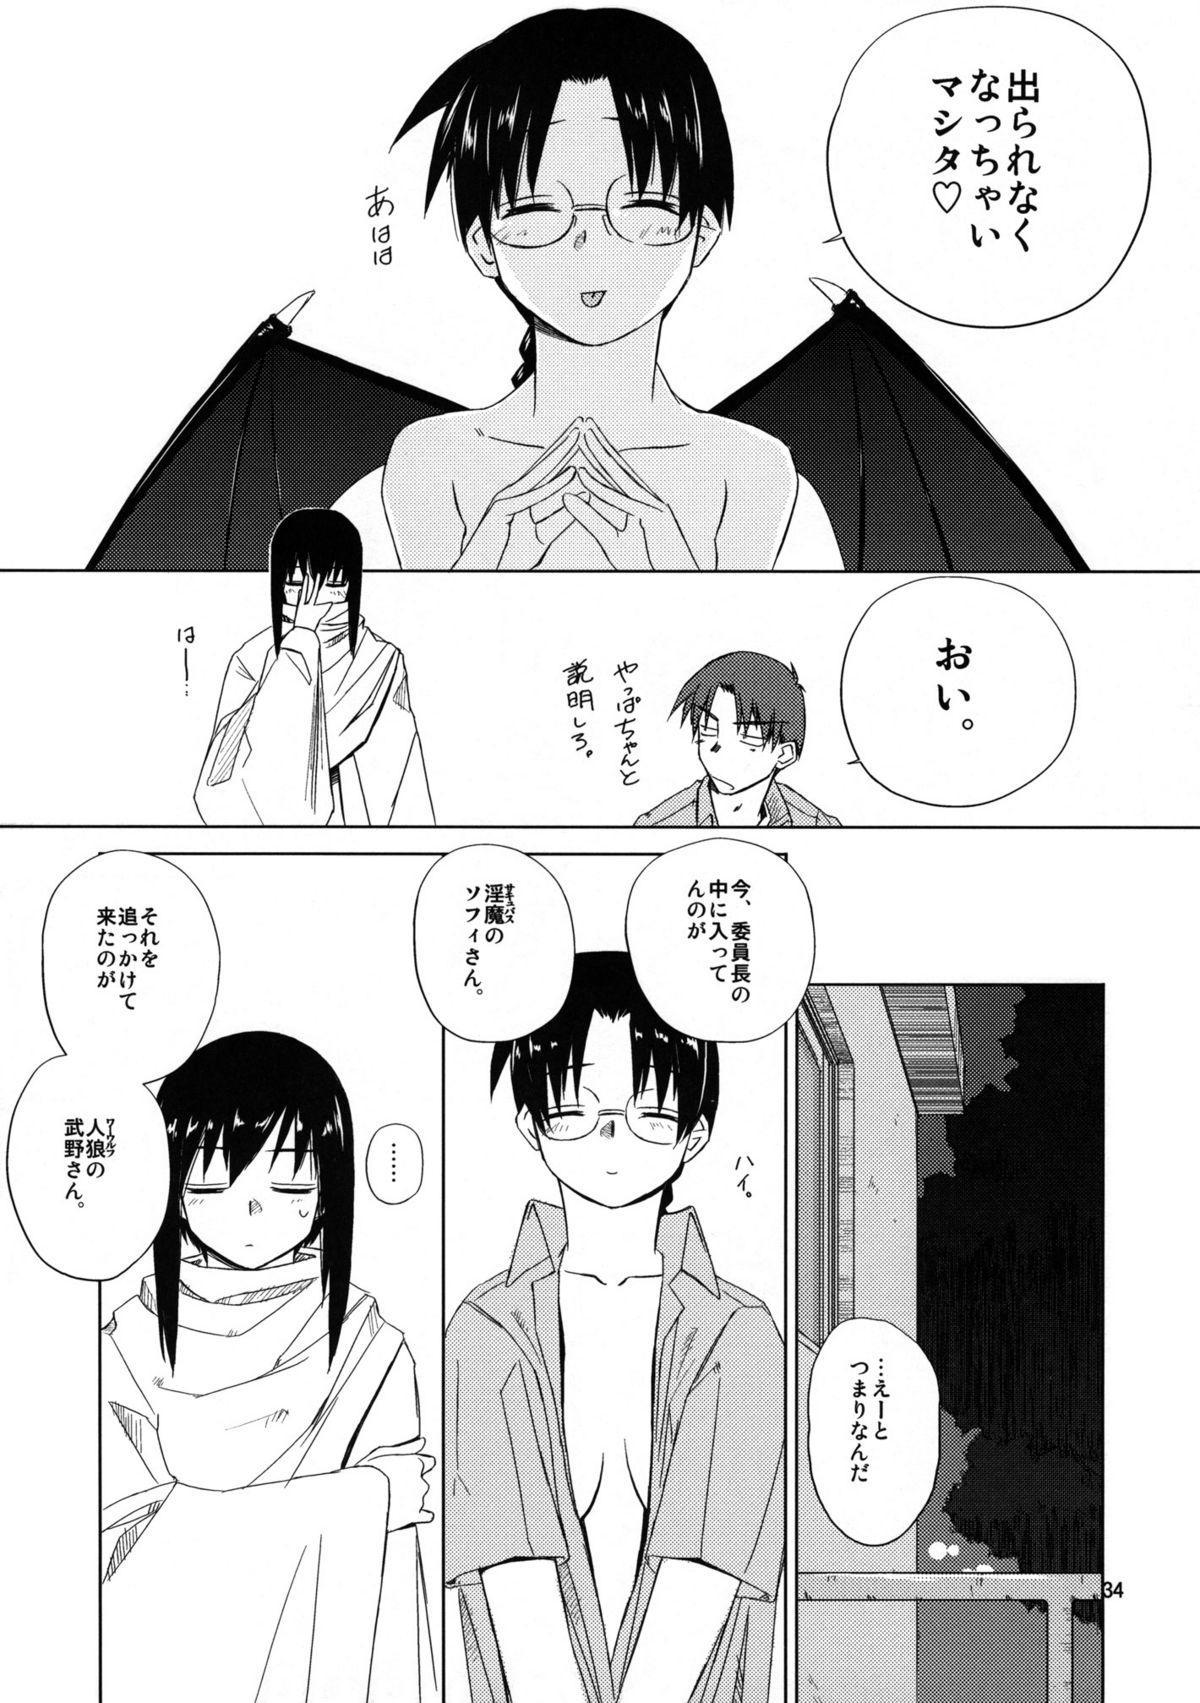 (C68) [Tear Drop (tsuina)] [C2] (To Heart) 34